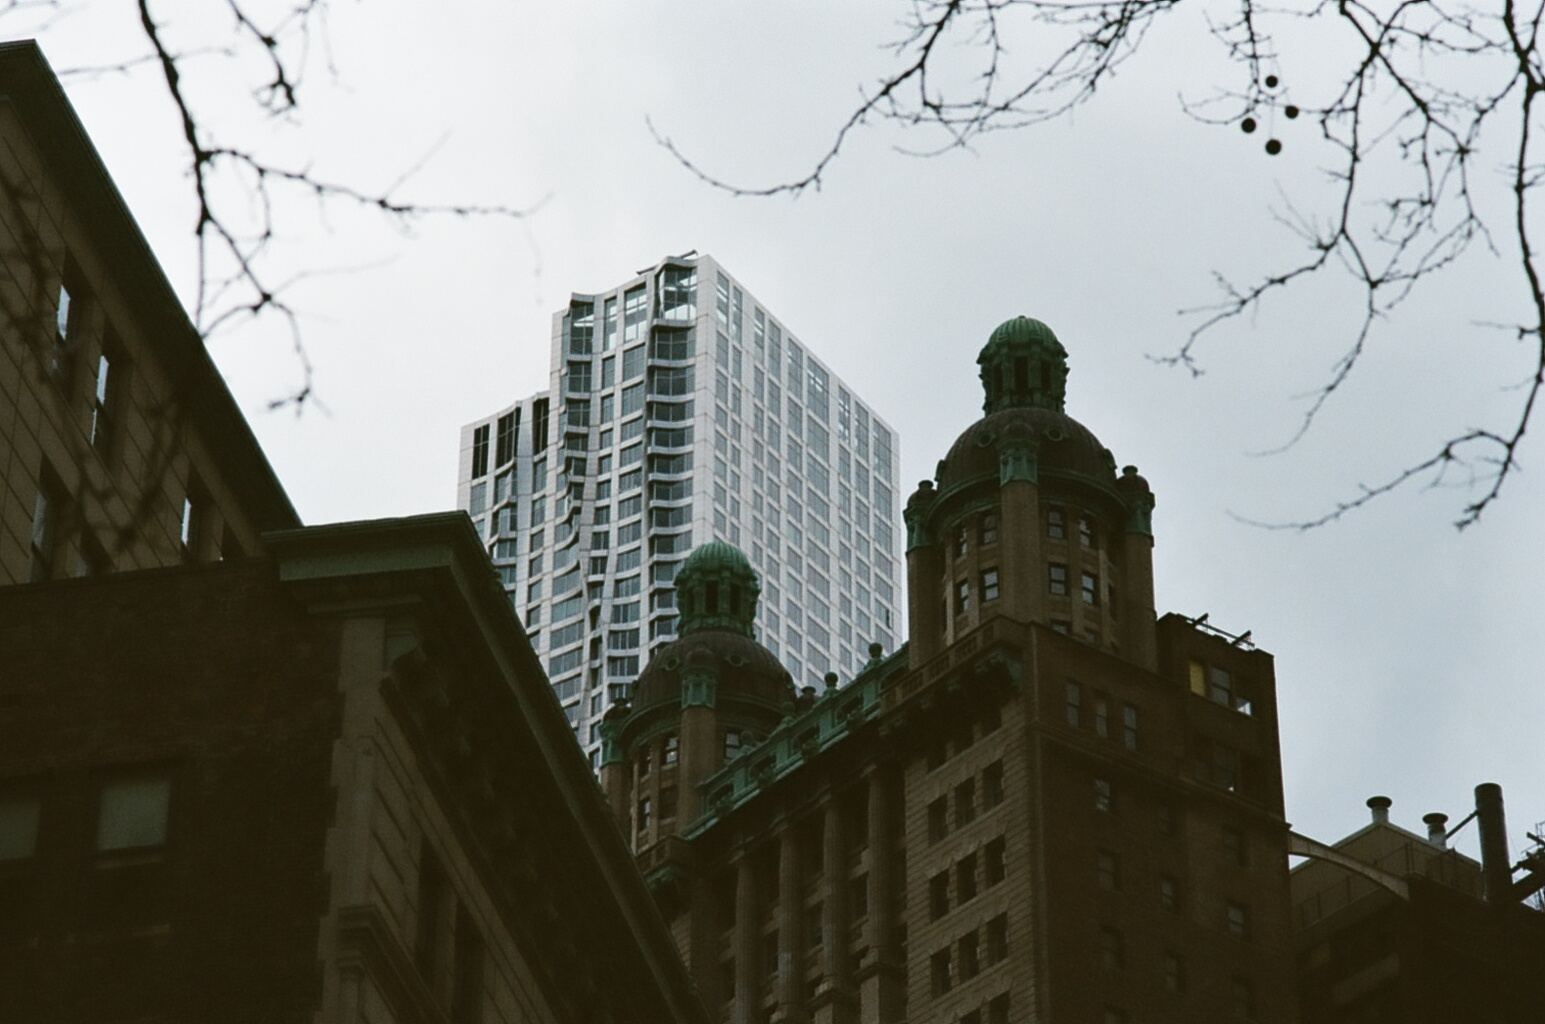 Going Analog, Full 35mm Photography Kit, New York building